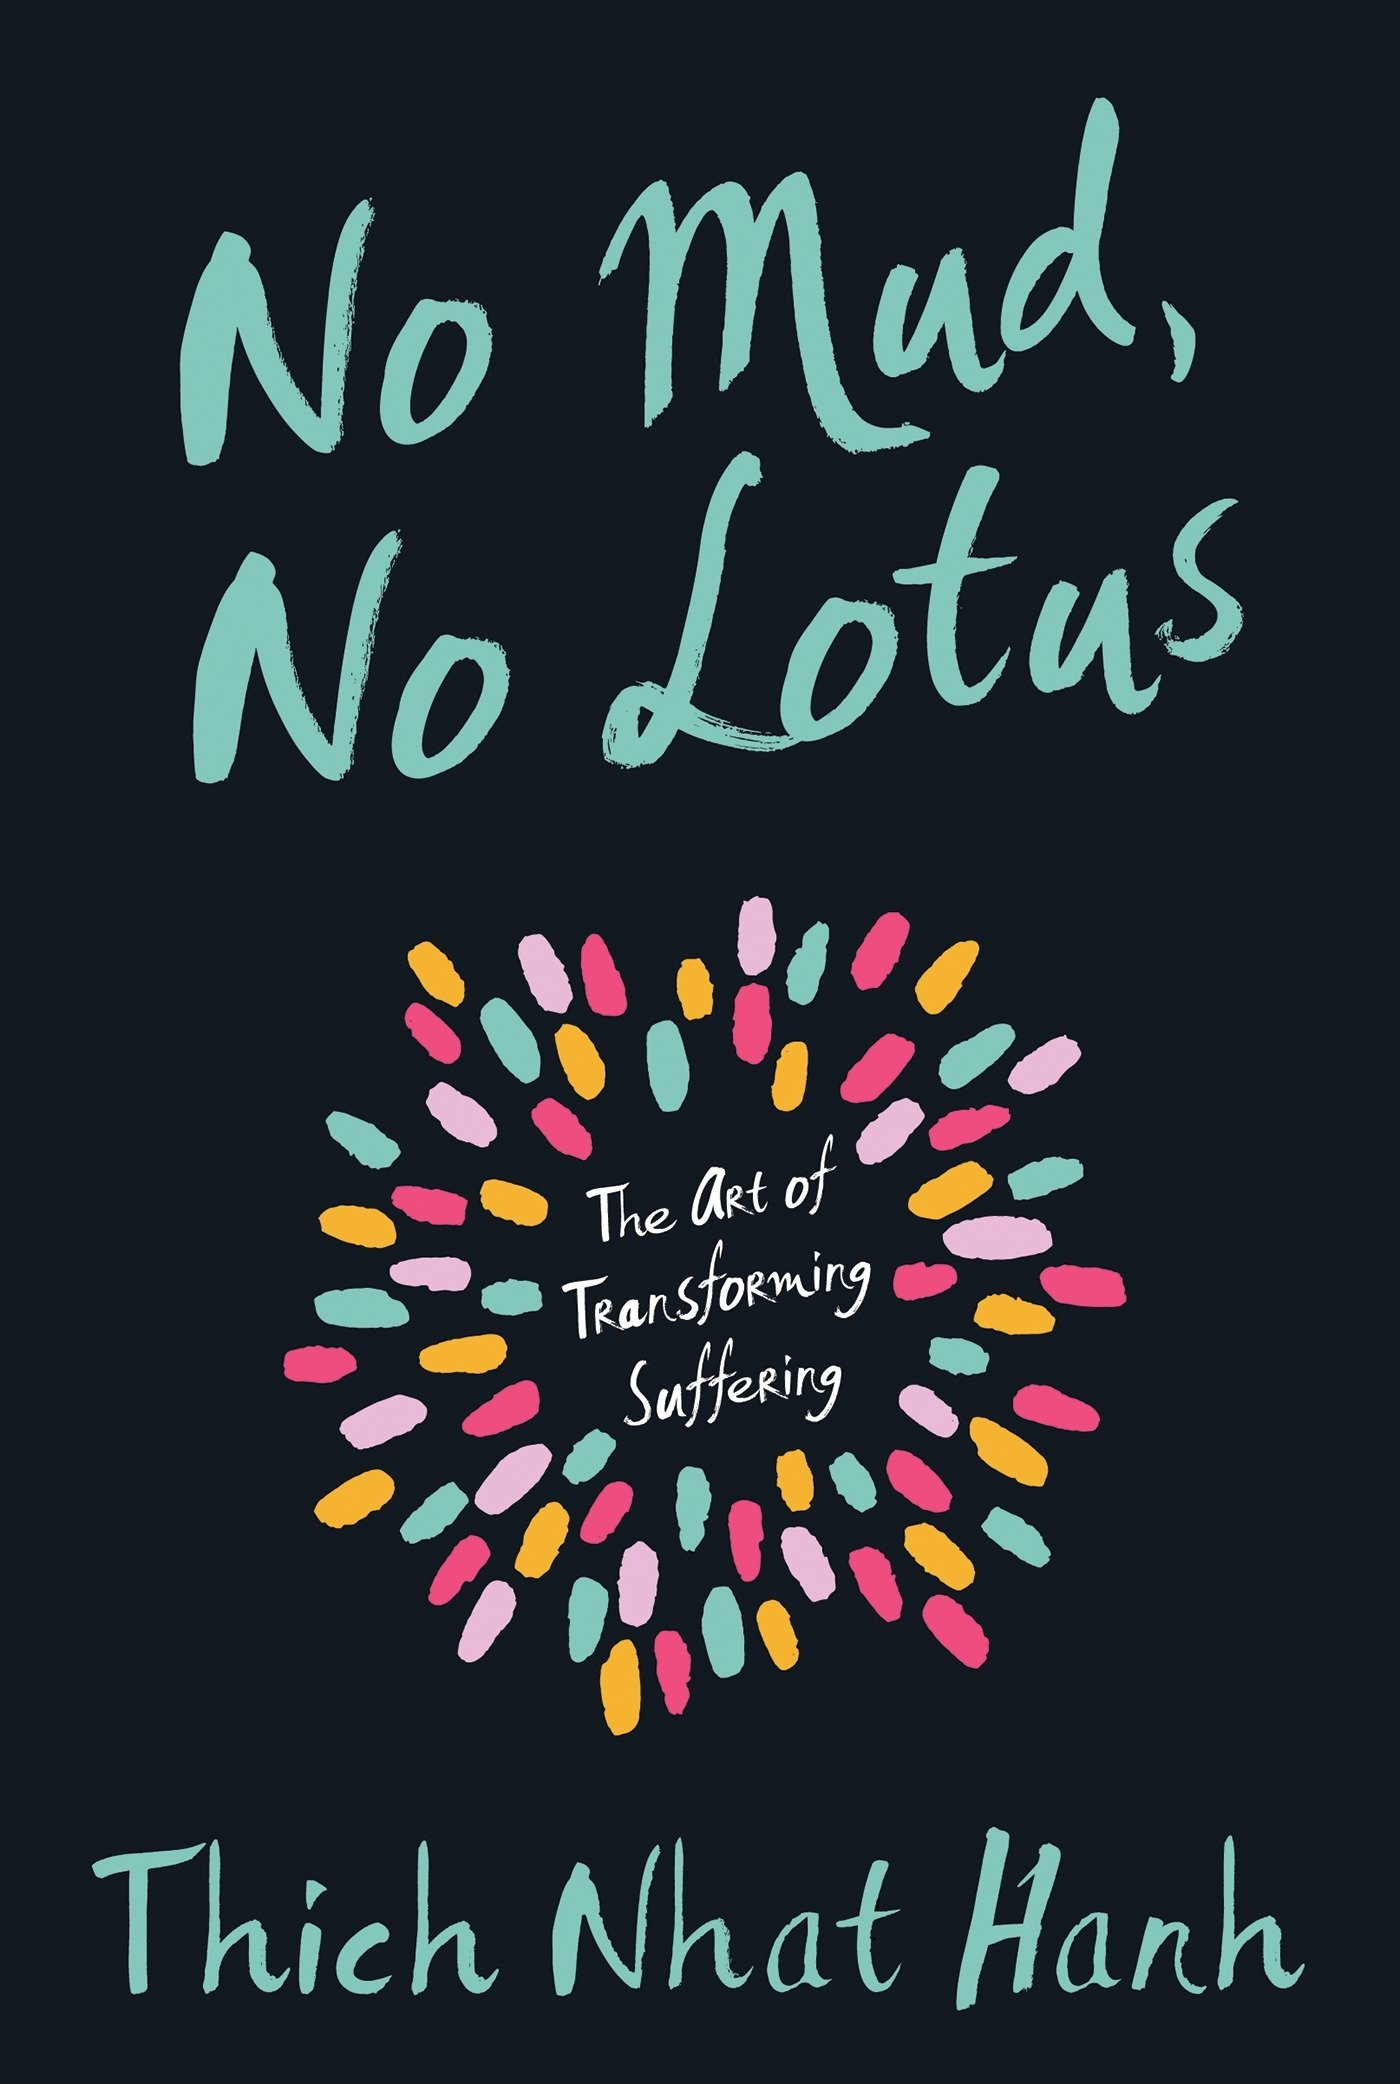 no-mud-no-lotus-the-art-of-transforming-suffering